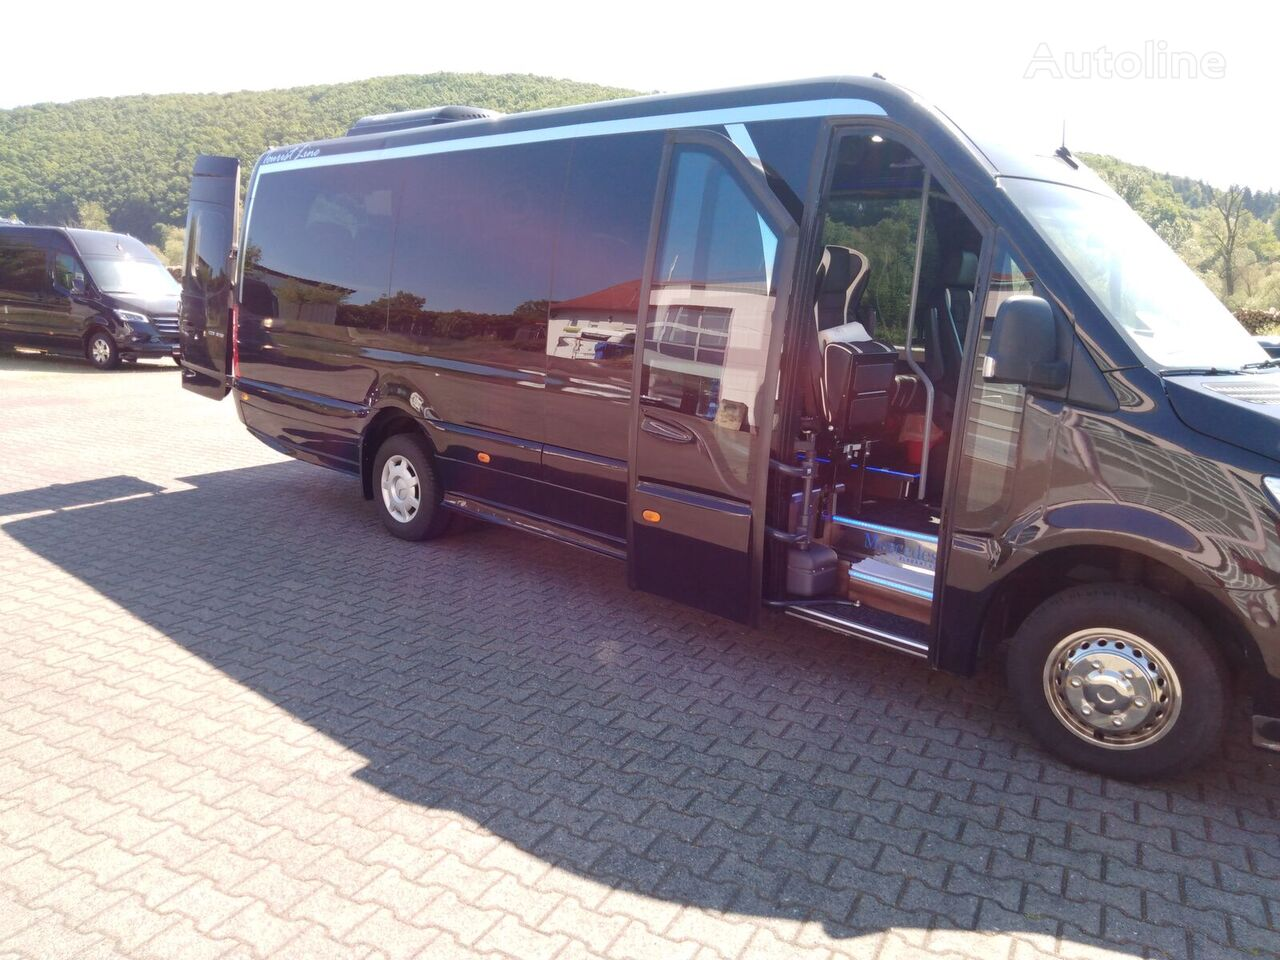 MERCEDES-BENZ Sprinter VVW 516CDI Autom TELMASchw 24 ,Panorama, KL,KS.SS uvm Reisebus